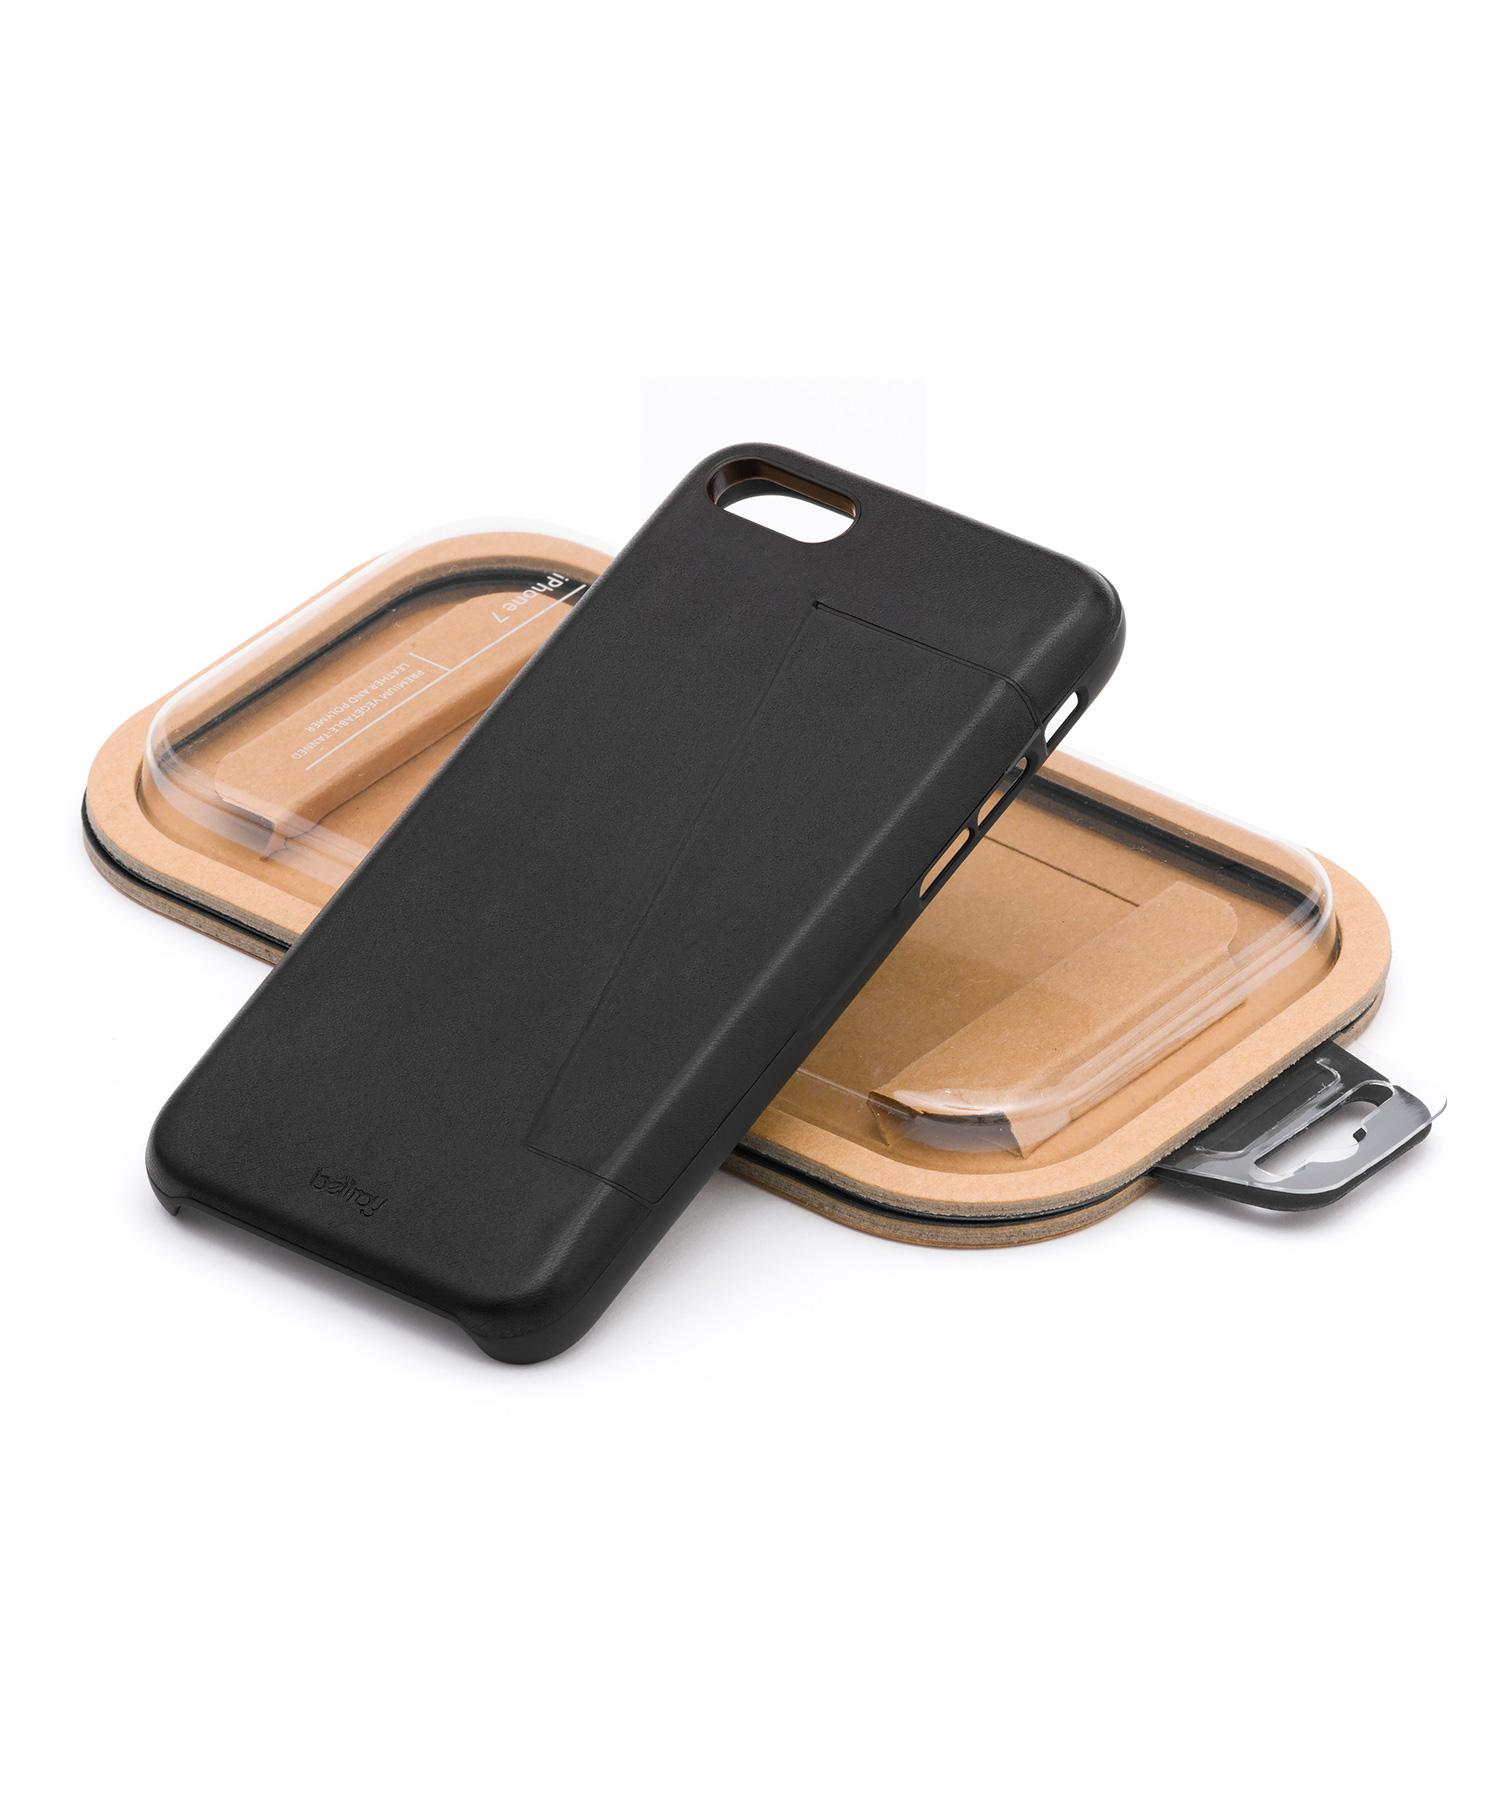 Bellroy Phone Case - 3 card <iPhone 8>